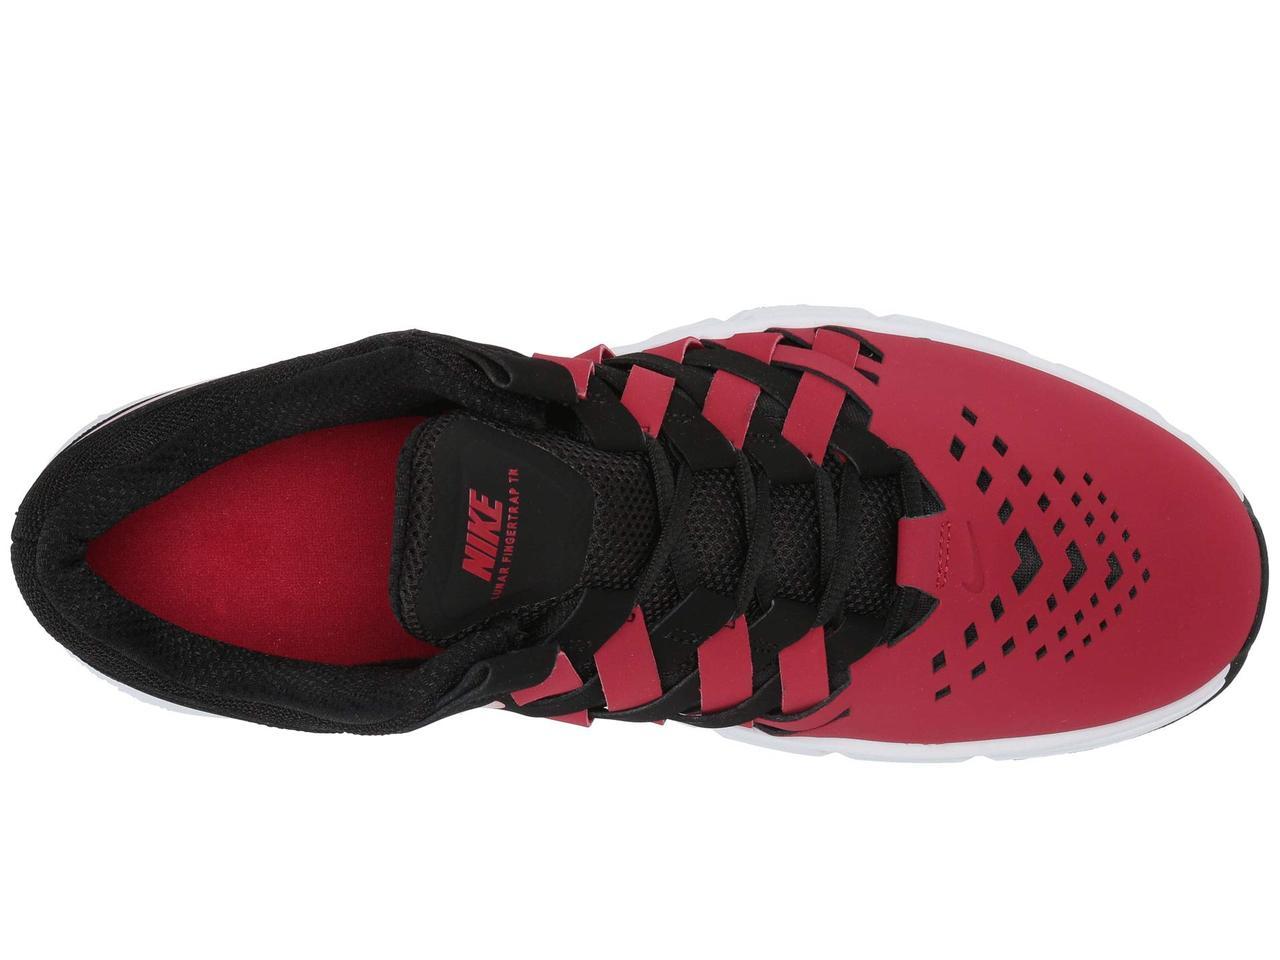 f5a3fb9d7e6b Кроссовки Кеды (Оригинал) Nike Lunar Fingertrap TR Black Gym Red 1 ...